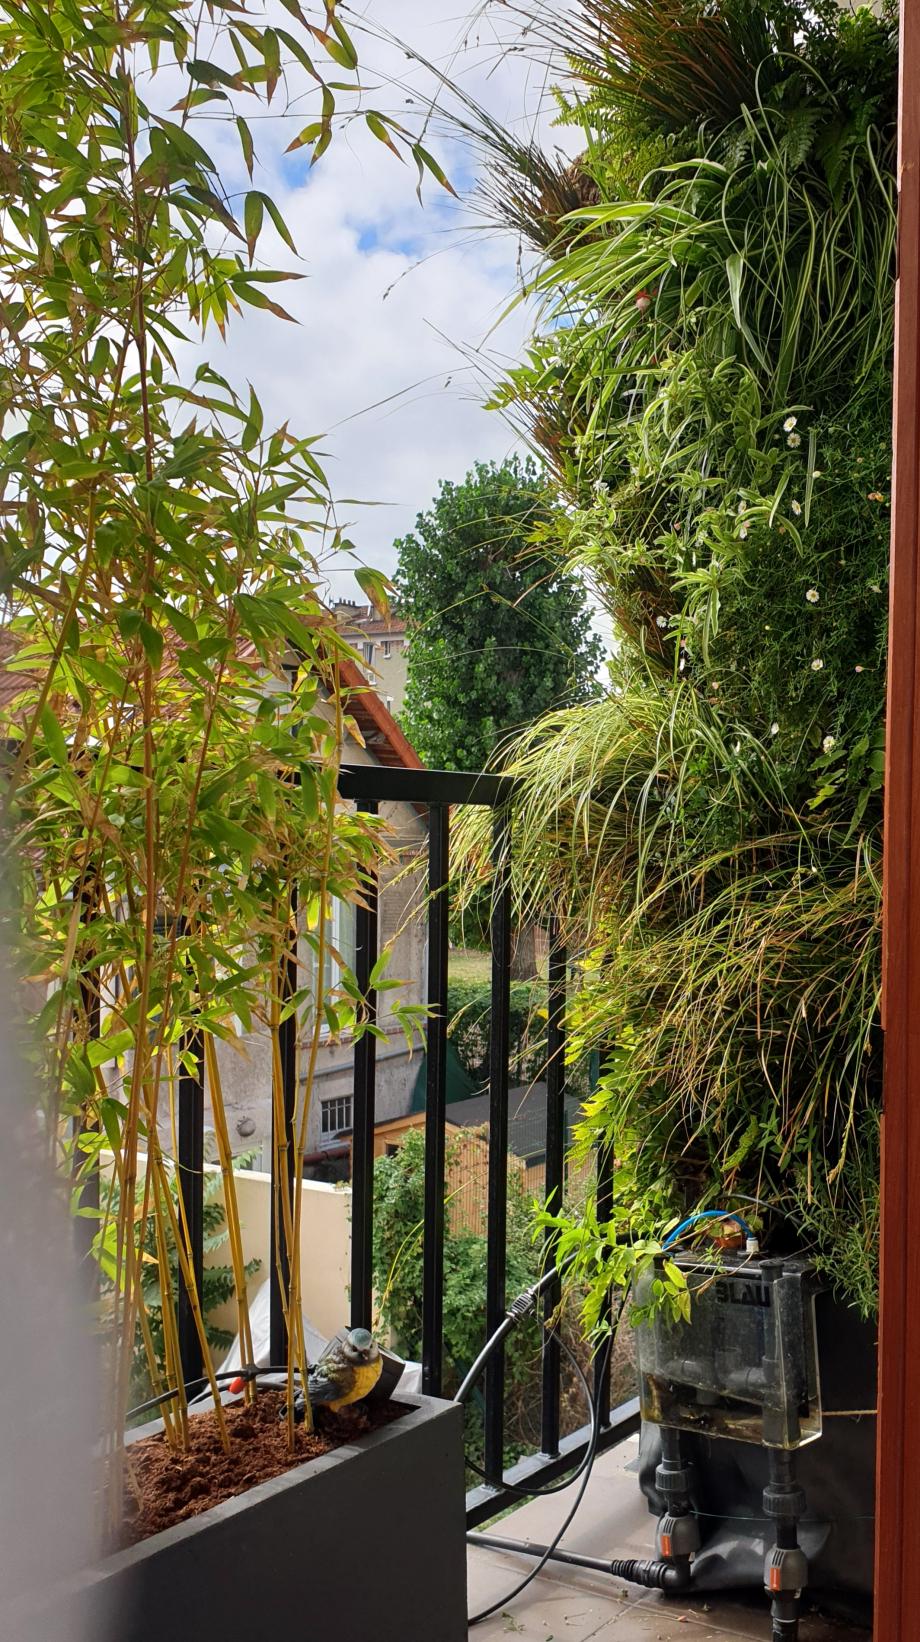 Vue balcon après raffraichissement bambous 120919.jpg